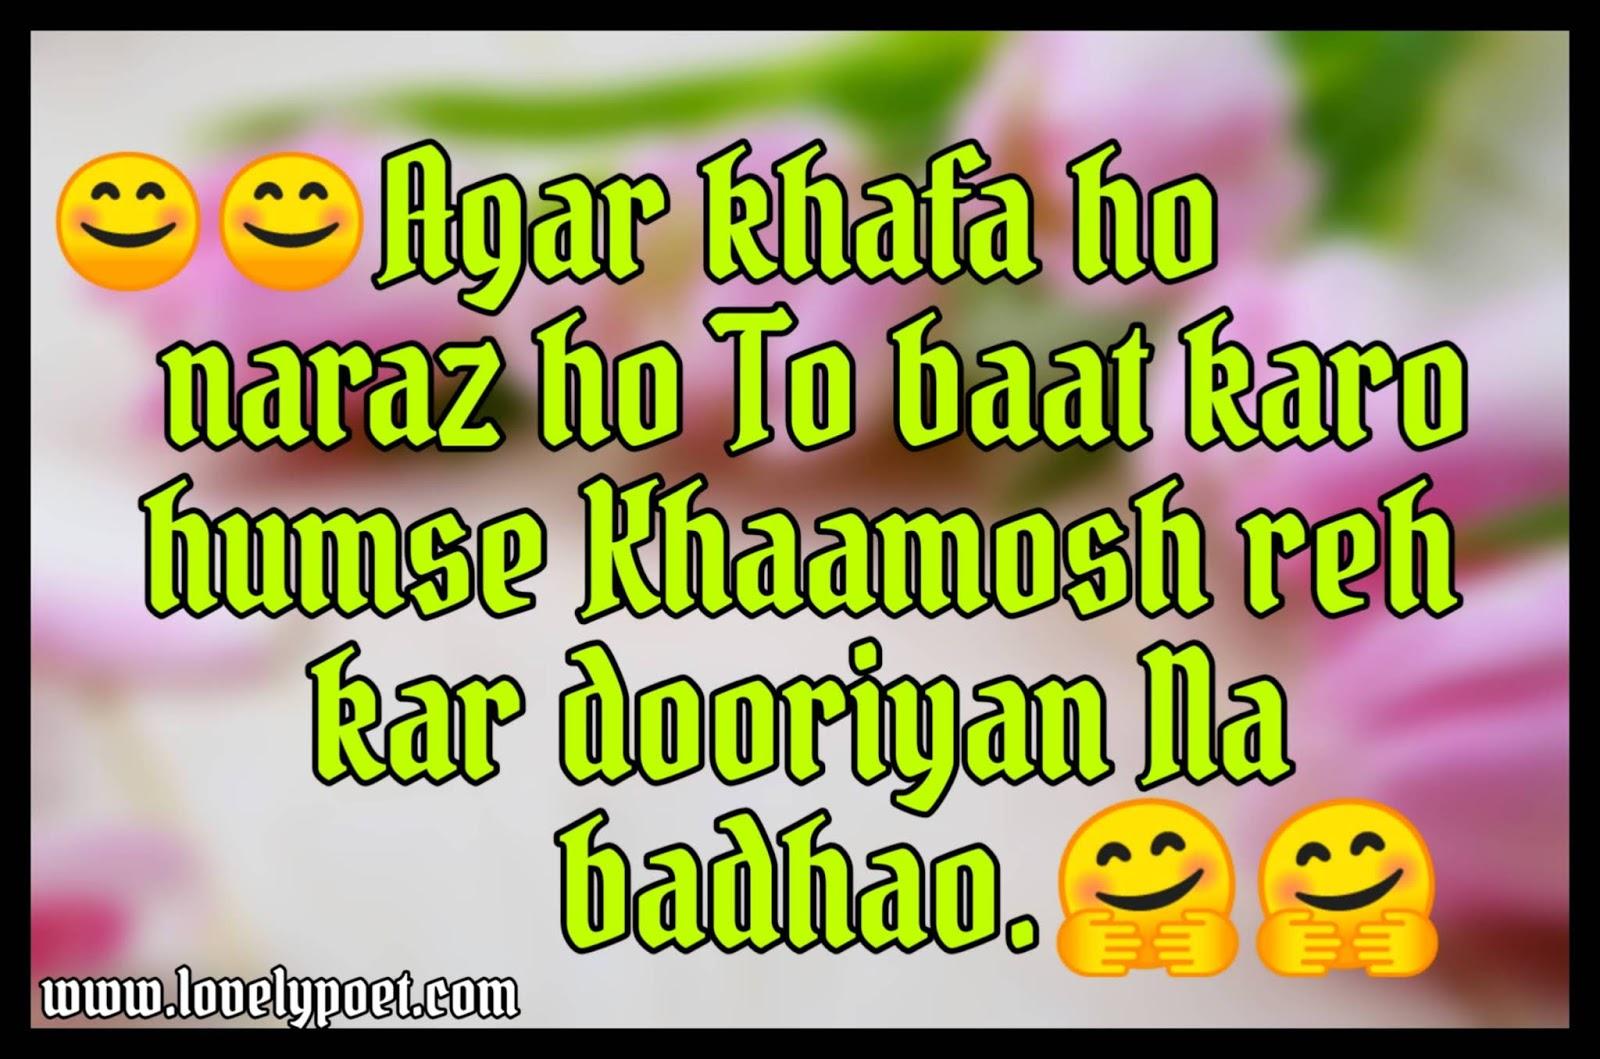 romantic-shayari-for-girl-friend-in-hindi